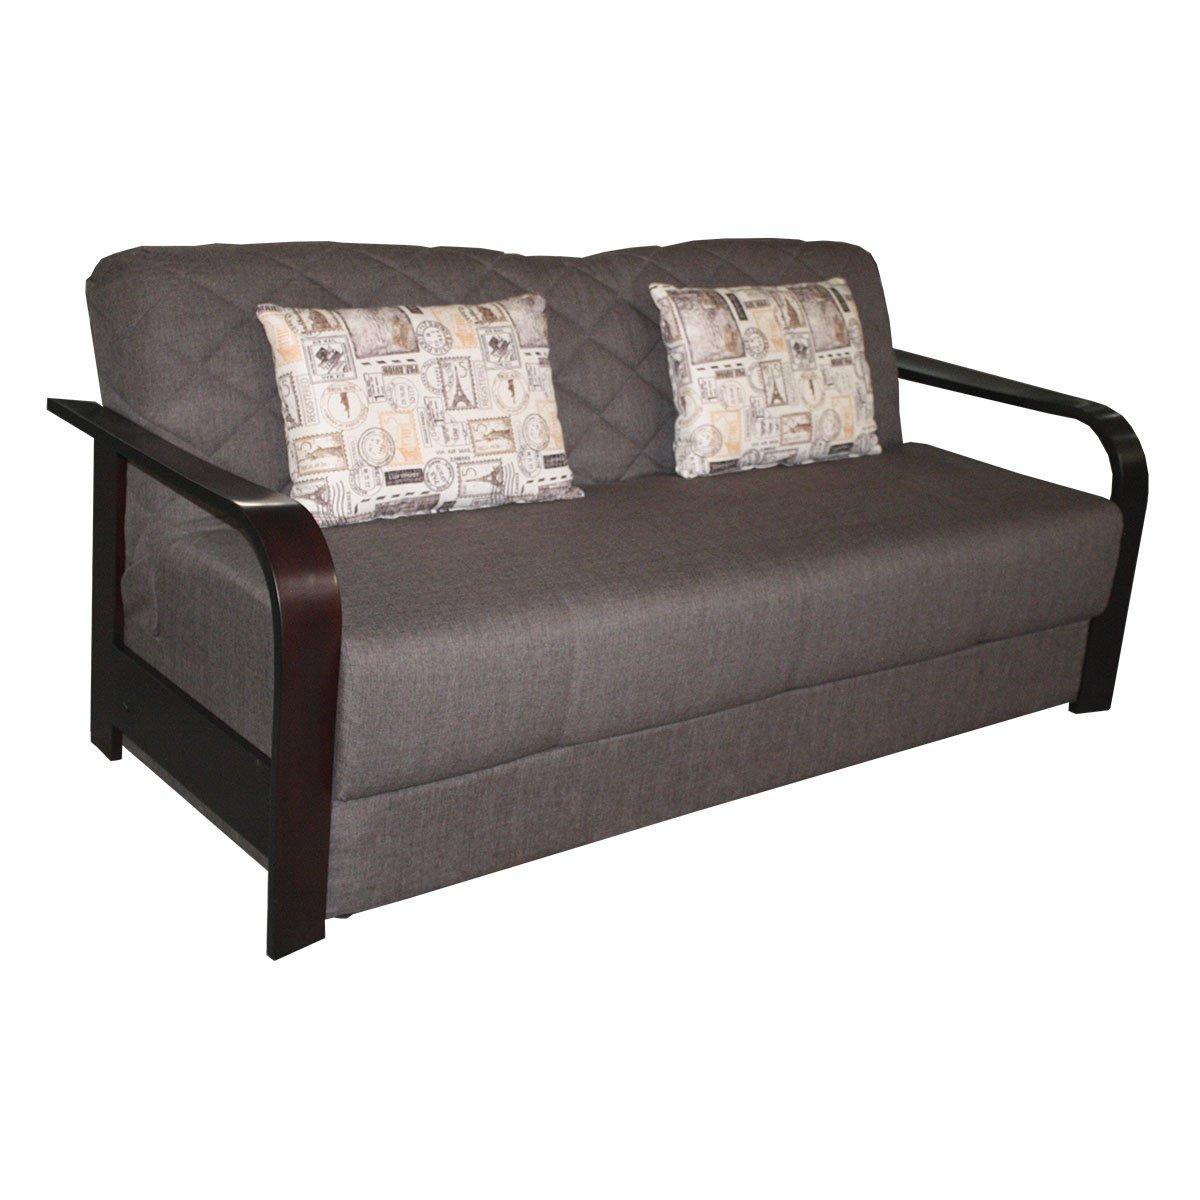 Sof cama impala sears com mx me entiende - La casa del sofa cama ...